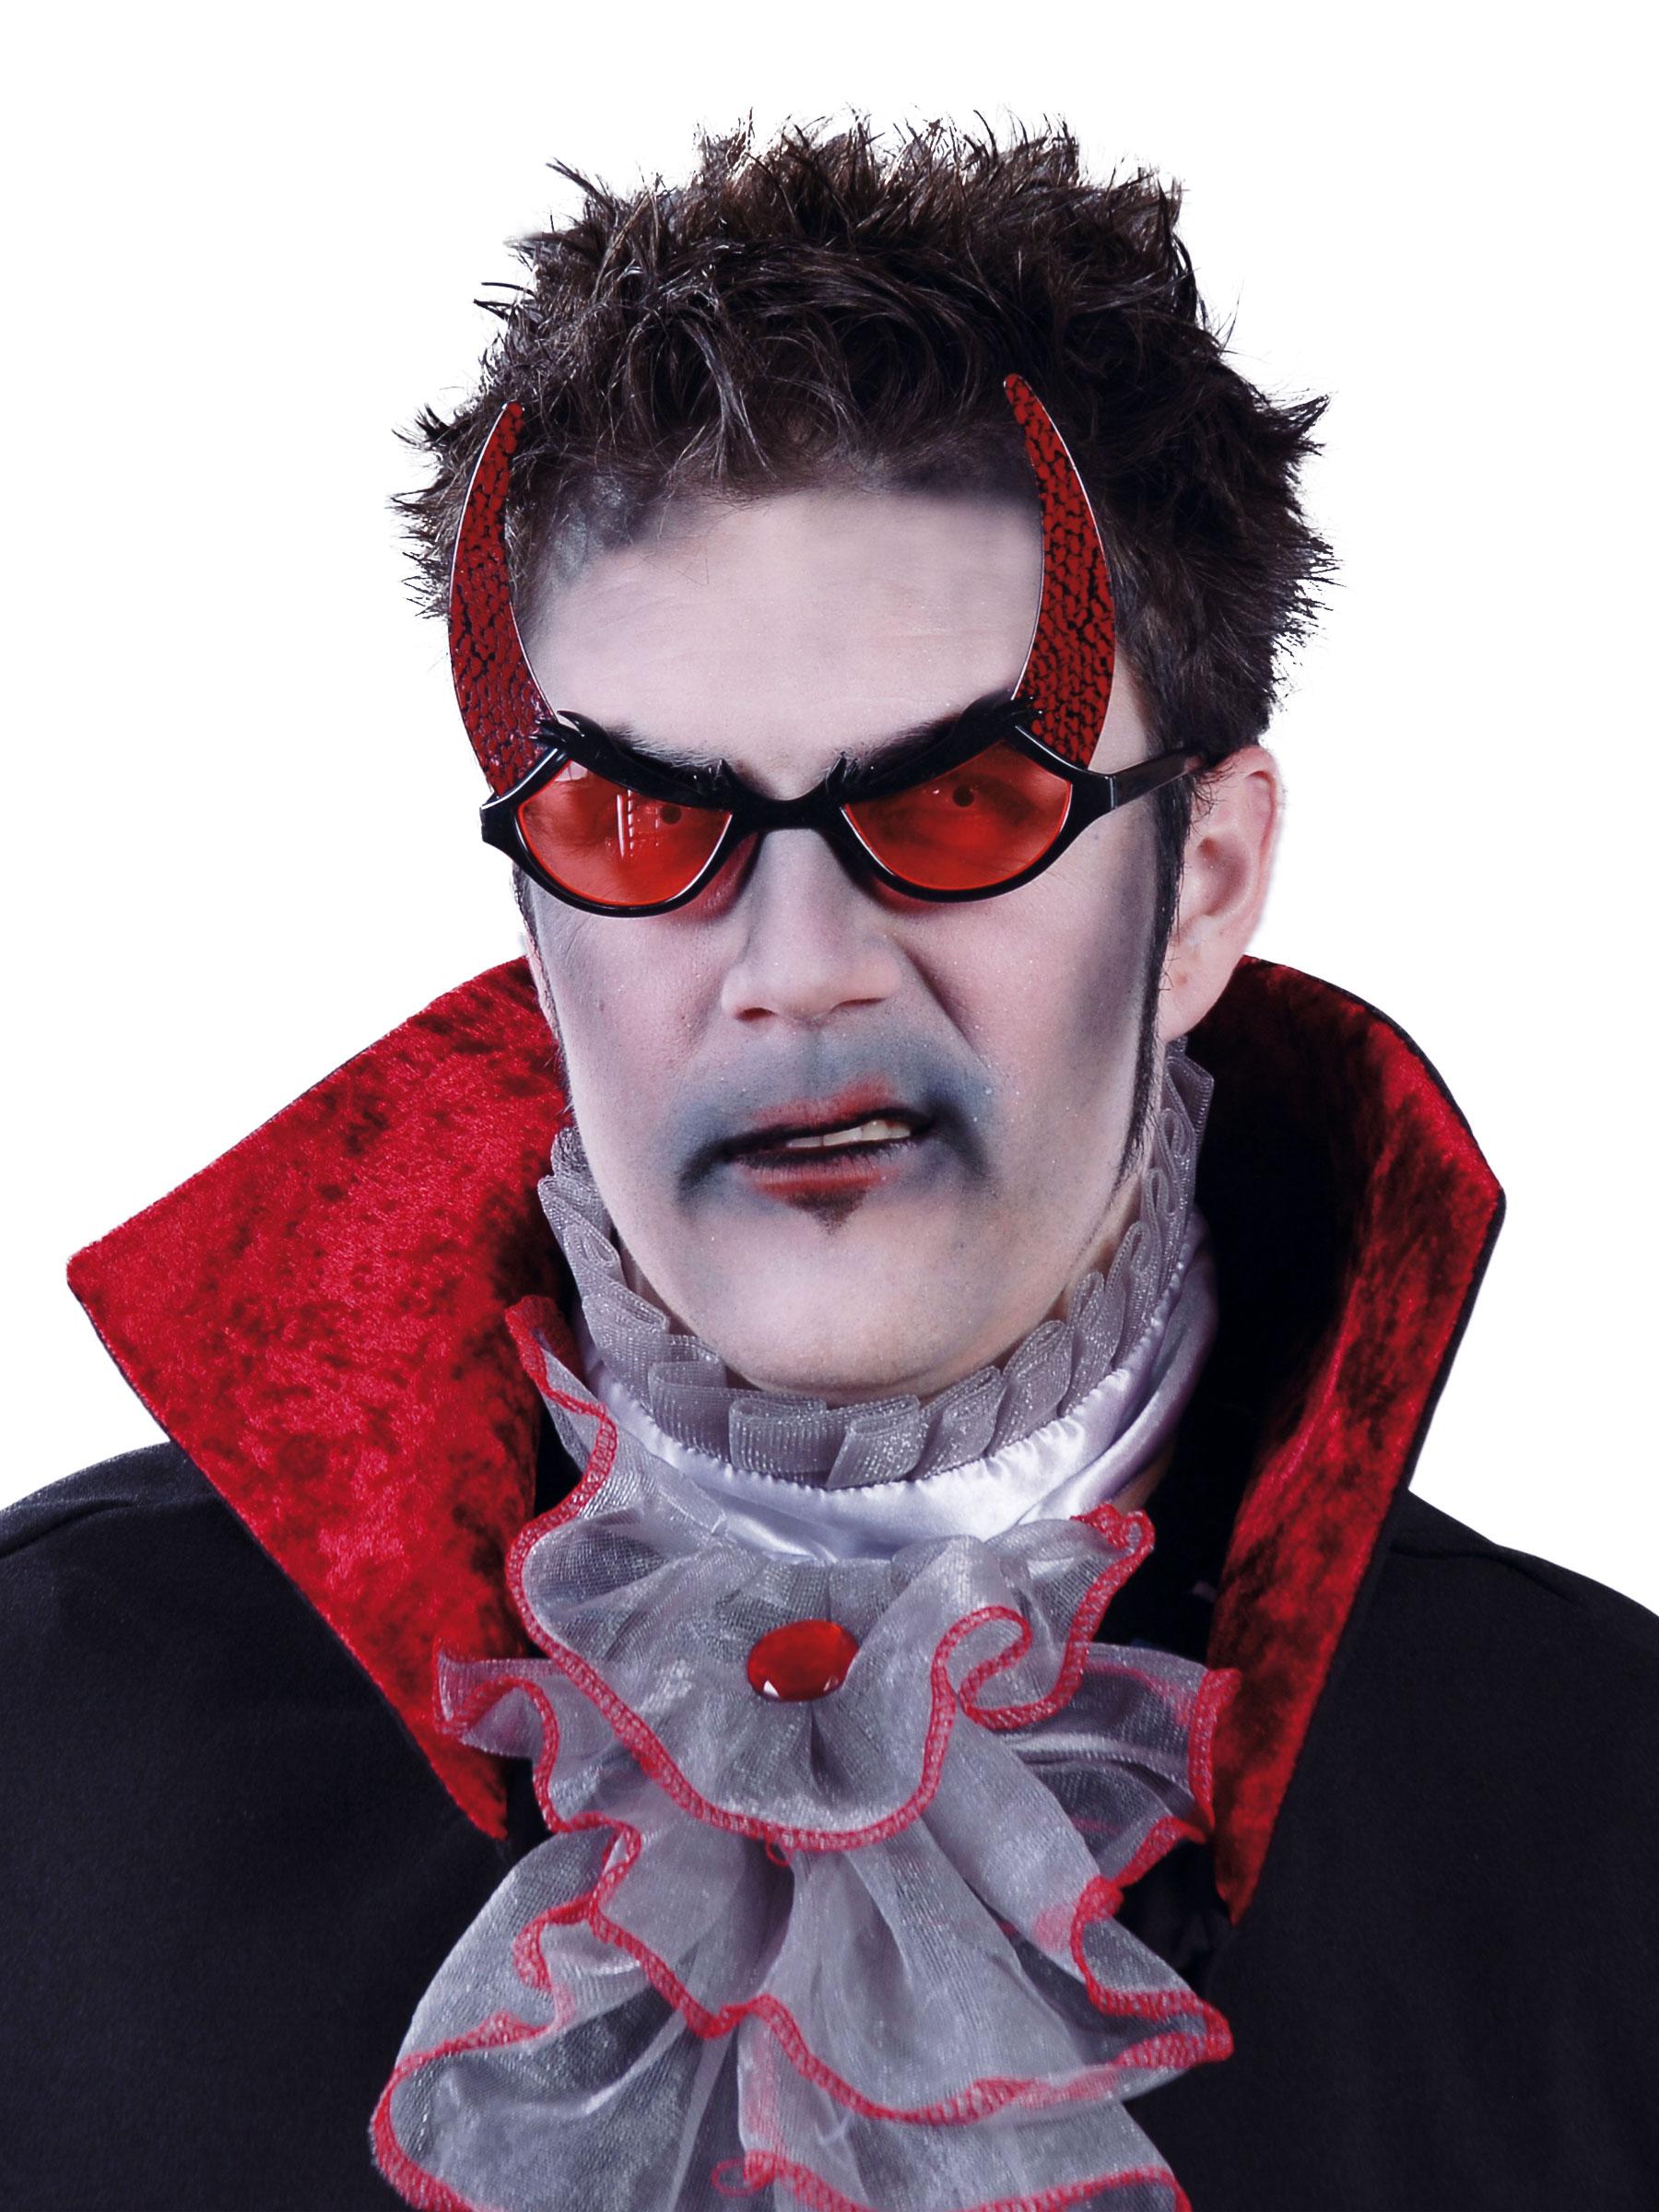 a5269f52423 Lunettes démon adulte Halloween   Deguise-toi